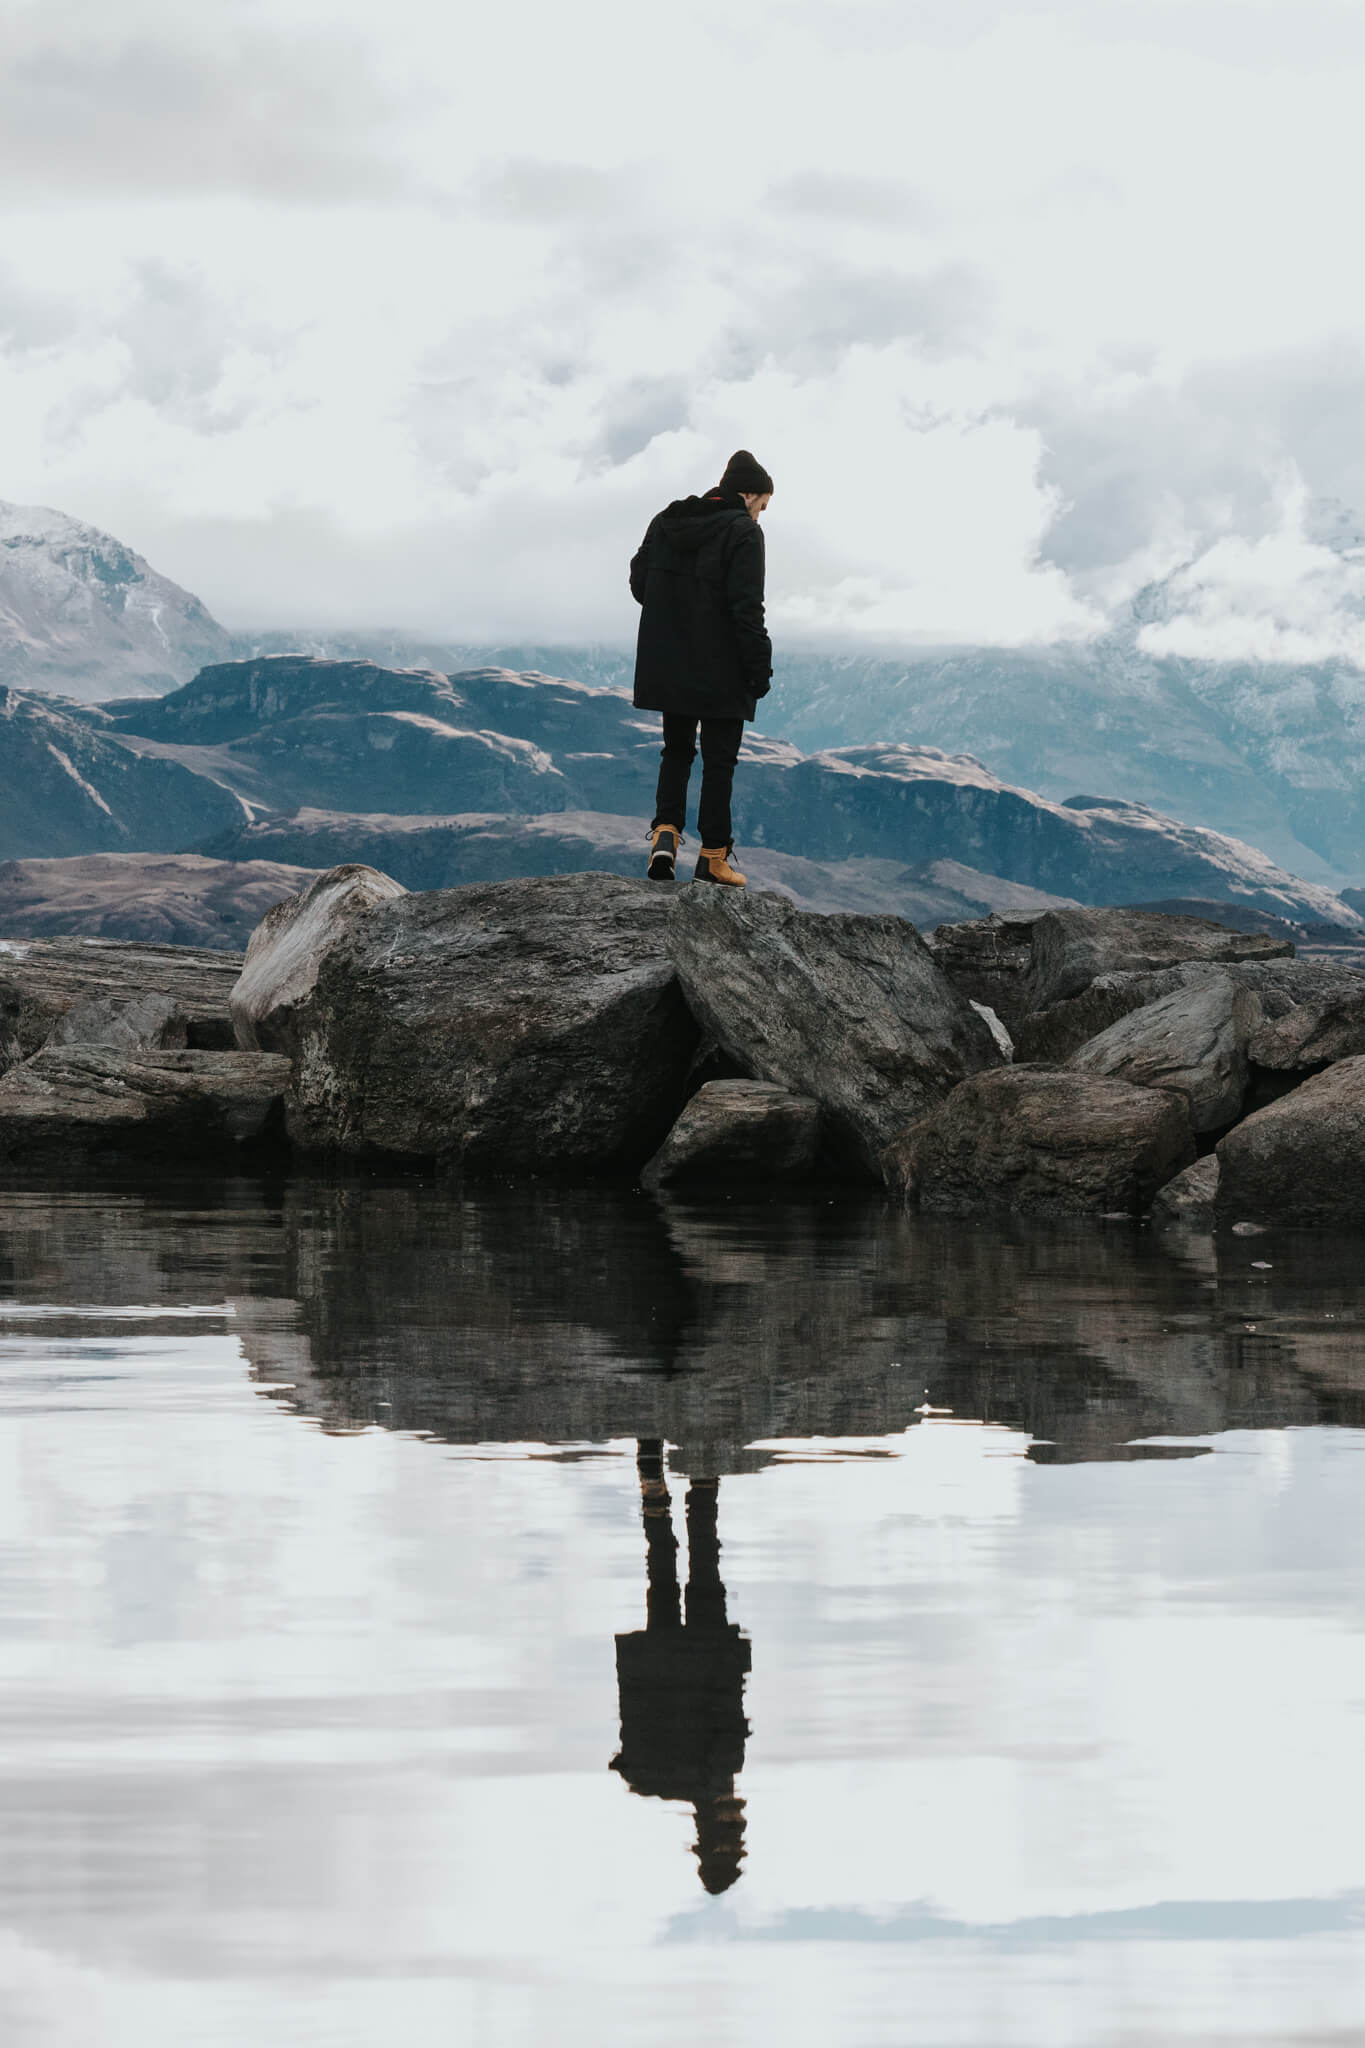 New-Zealand-Travel-Photography-Natalie-Skoric-15.jpg